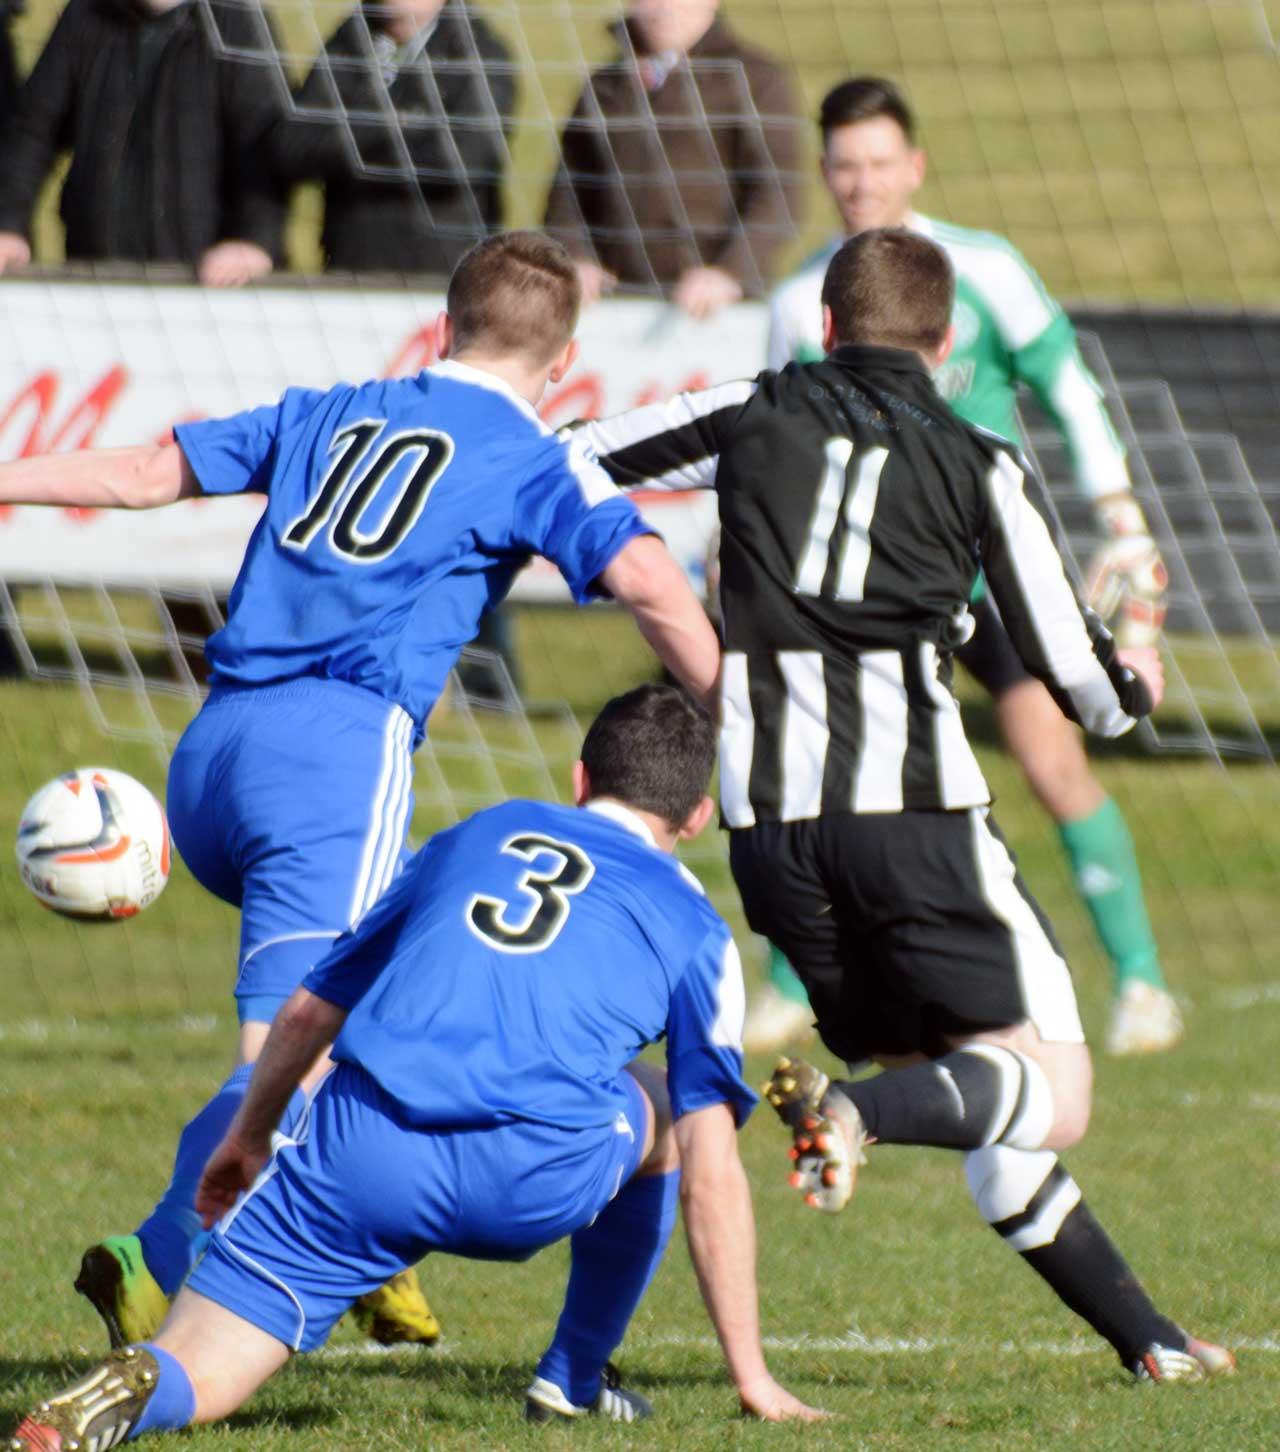 Photo: Highland League Cup semi final - Wick Academy 2 Nairn County 1